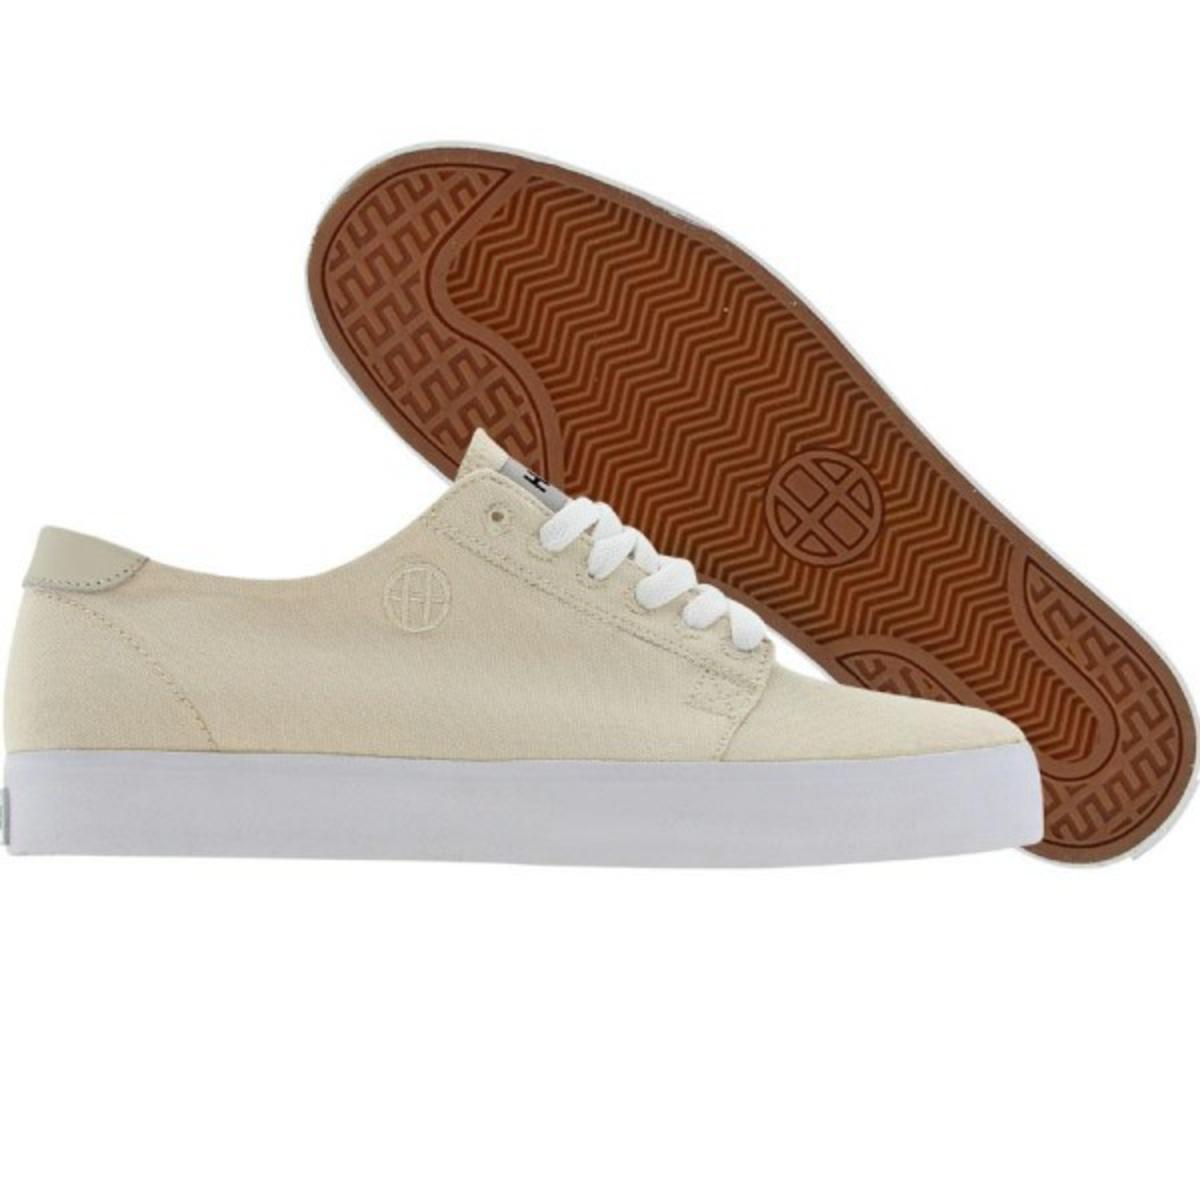 HUF Skateboard Schuhe Morton Light grau Turnschuhe schuhe Turnschuhe Light grau